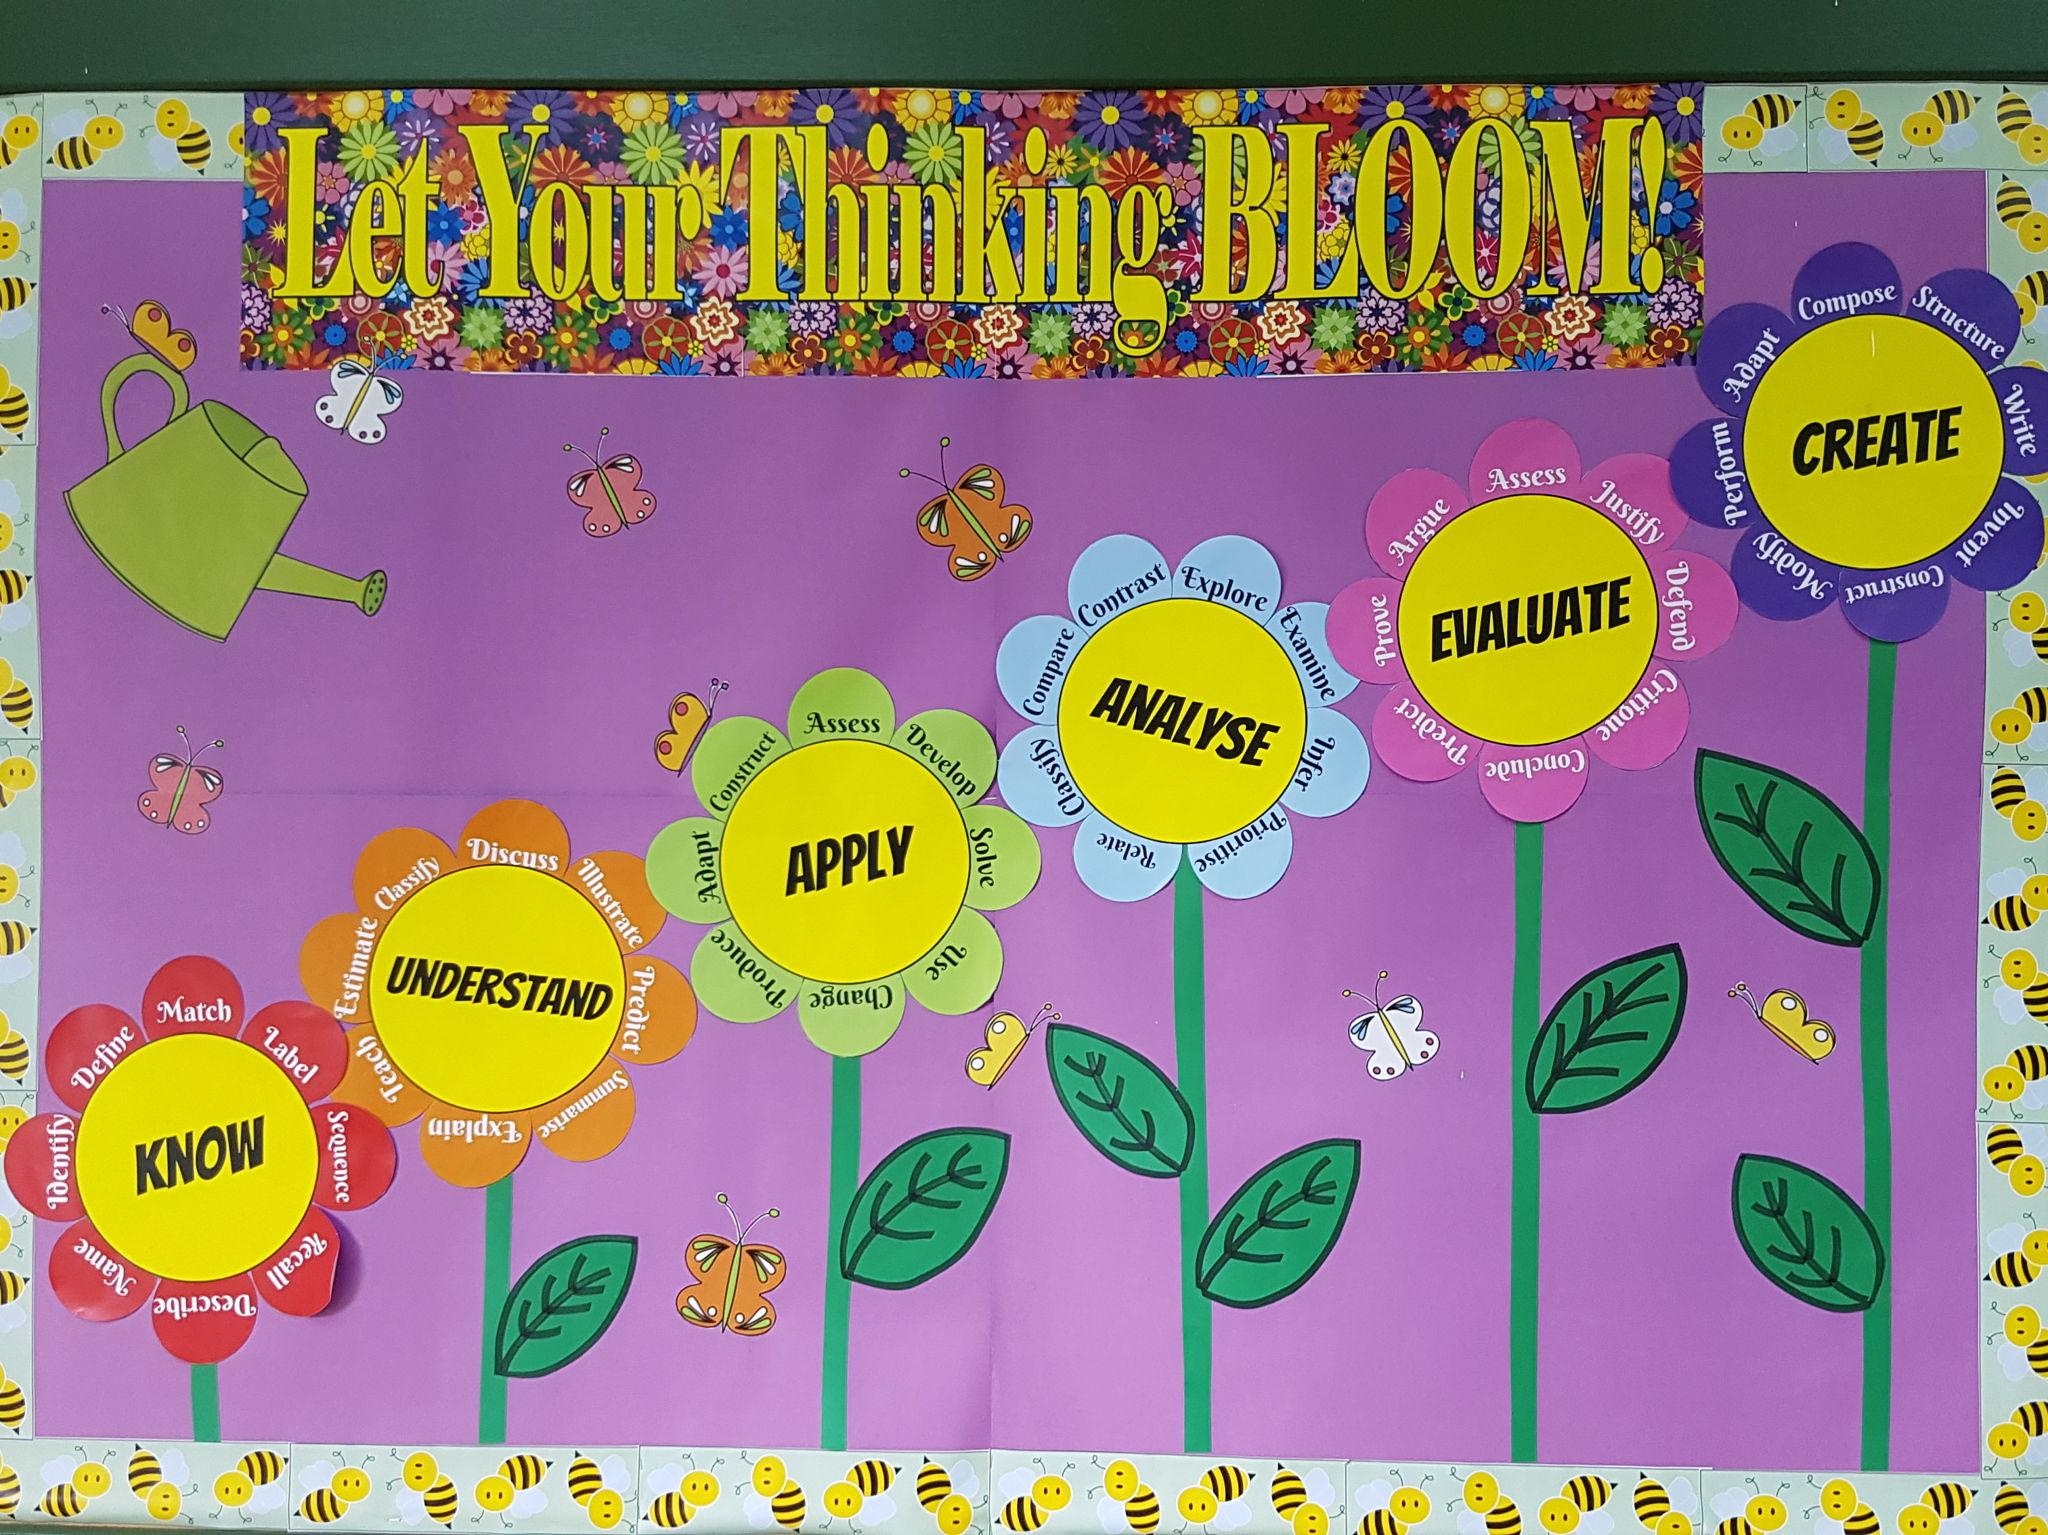 Bloom's Taxonomy display